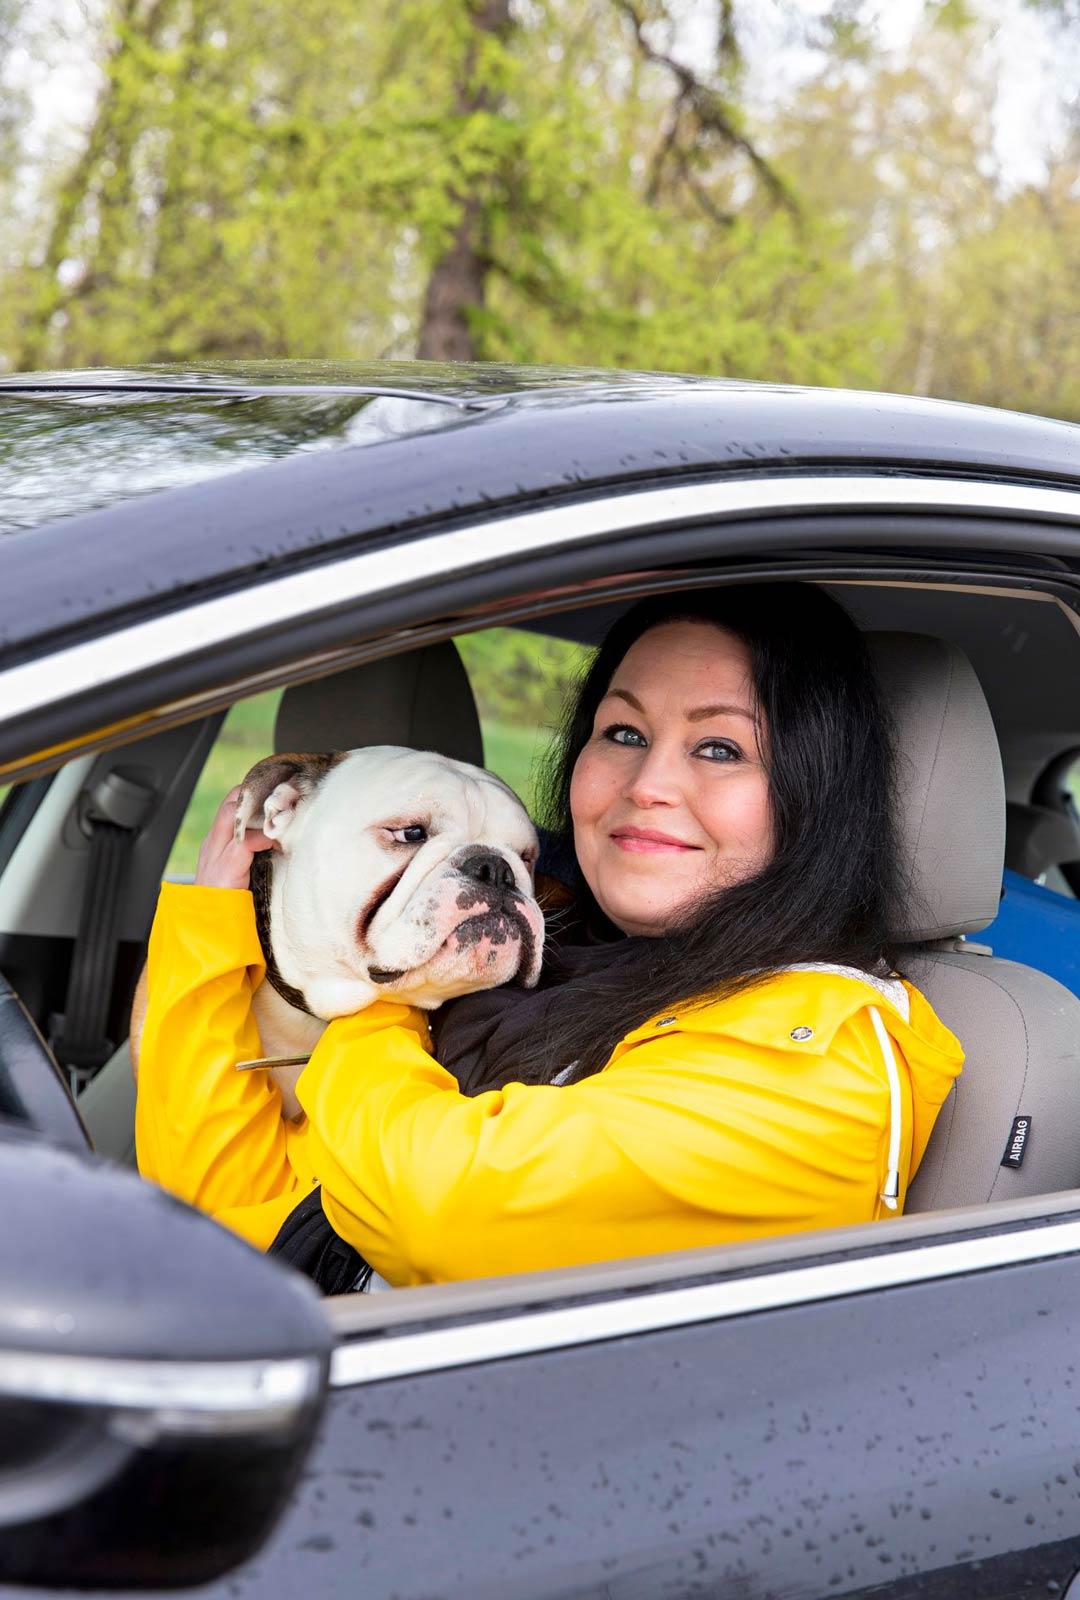 Maria Jyrkäs ja 1-vuotias englanninbulldoggipoika Hulk,joka on omistajansa reissukaveri ja hyvinvointivalmentaja.